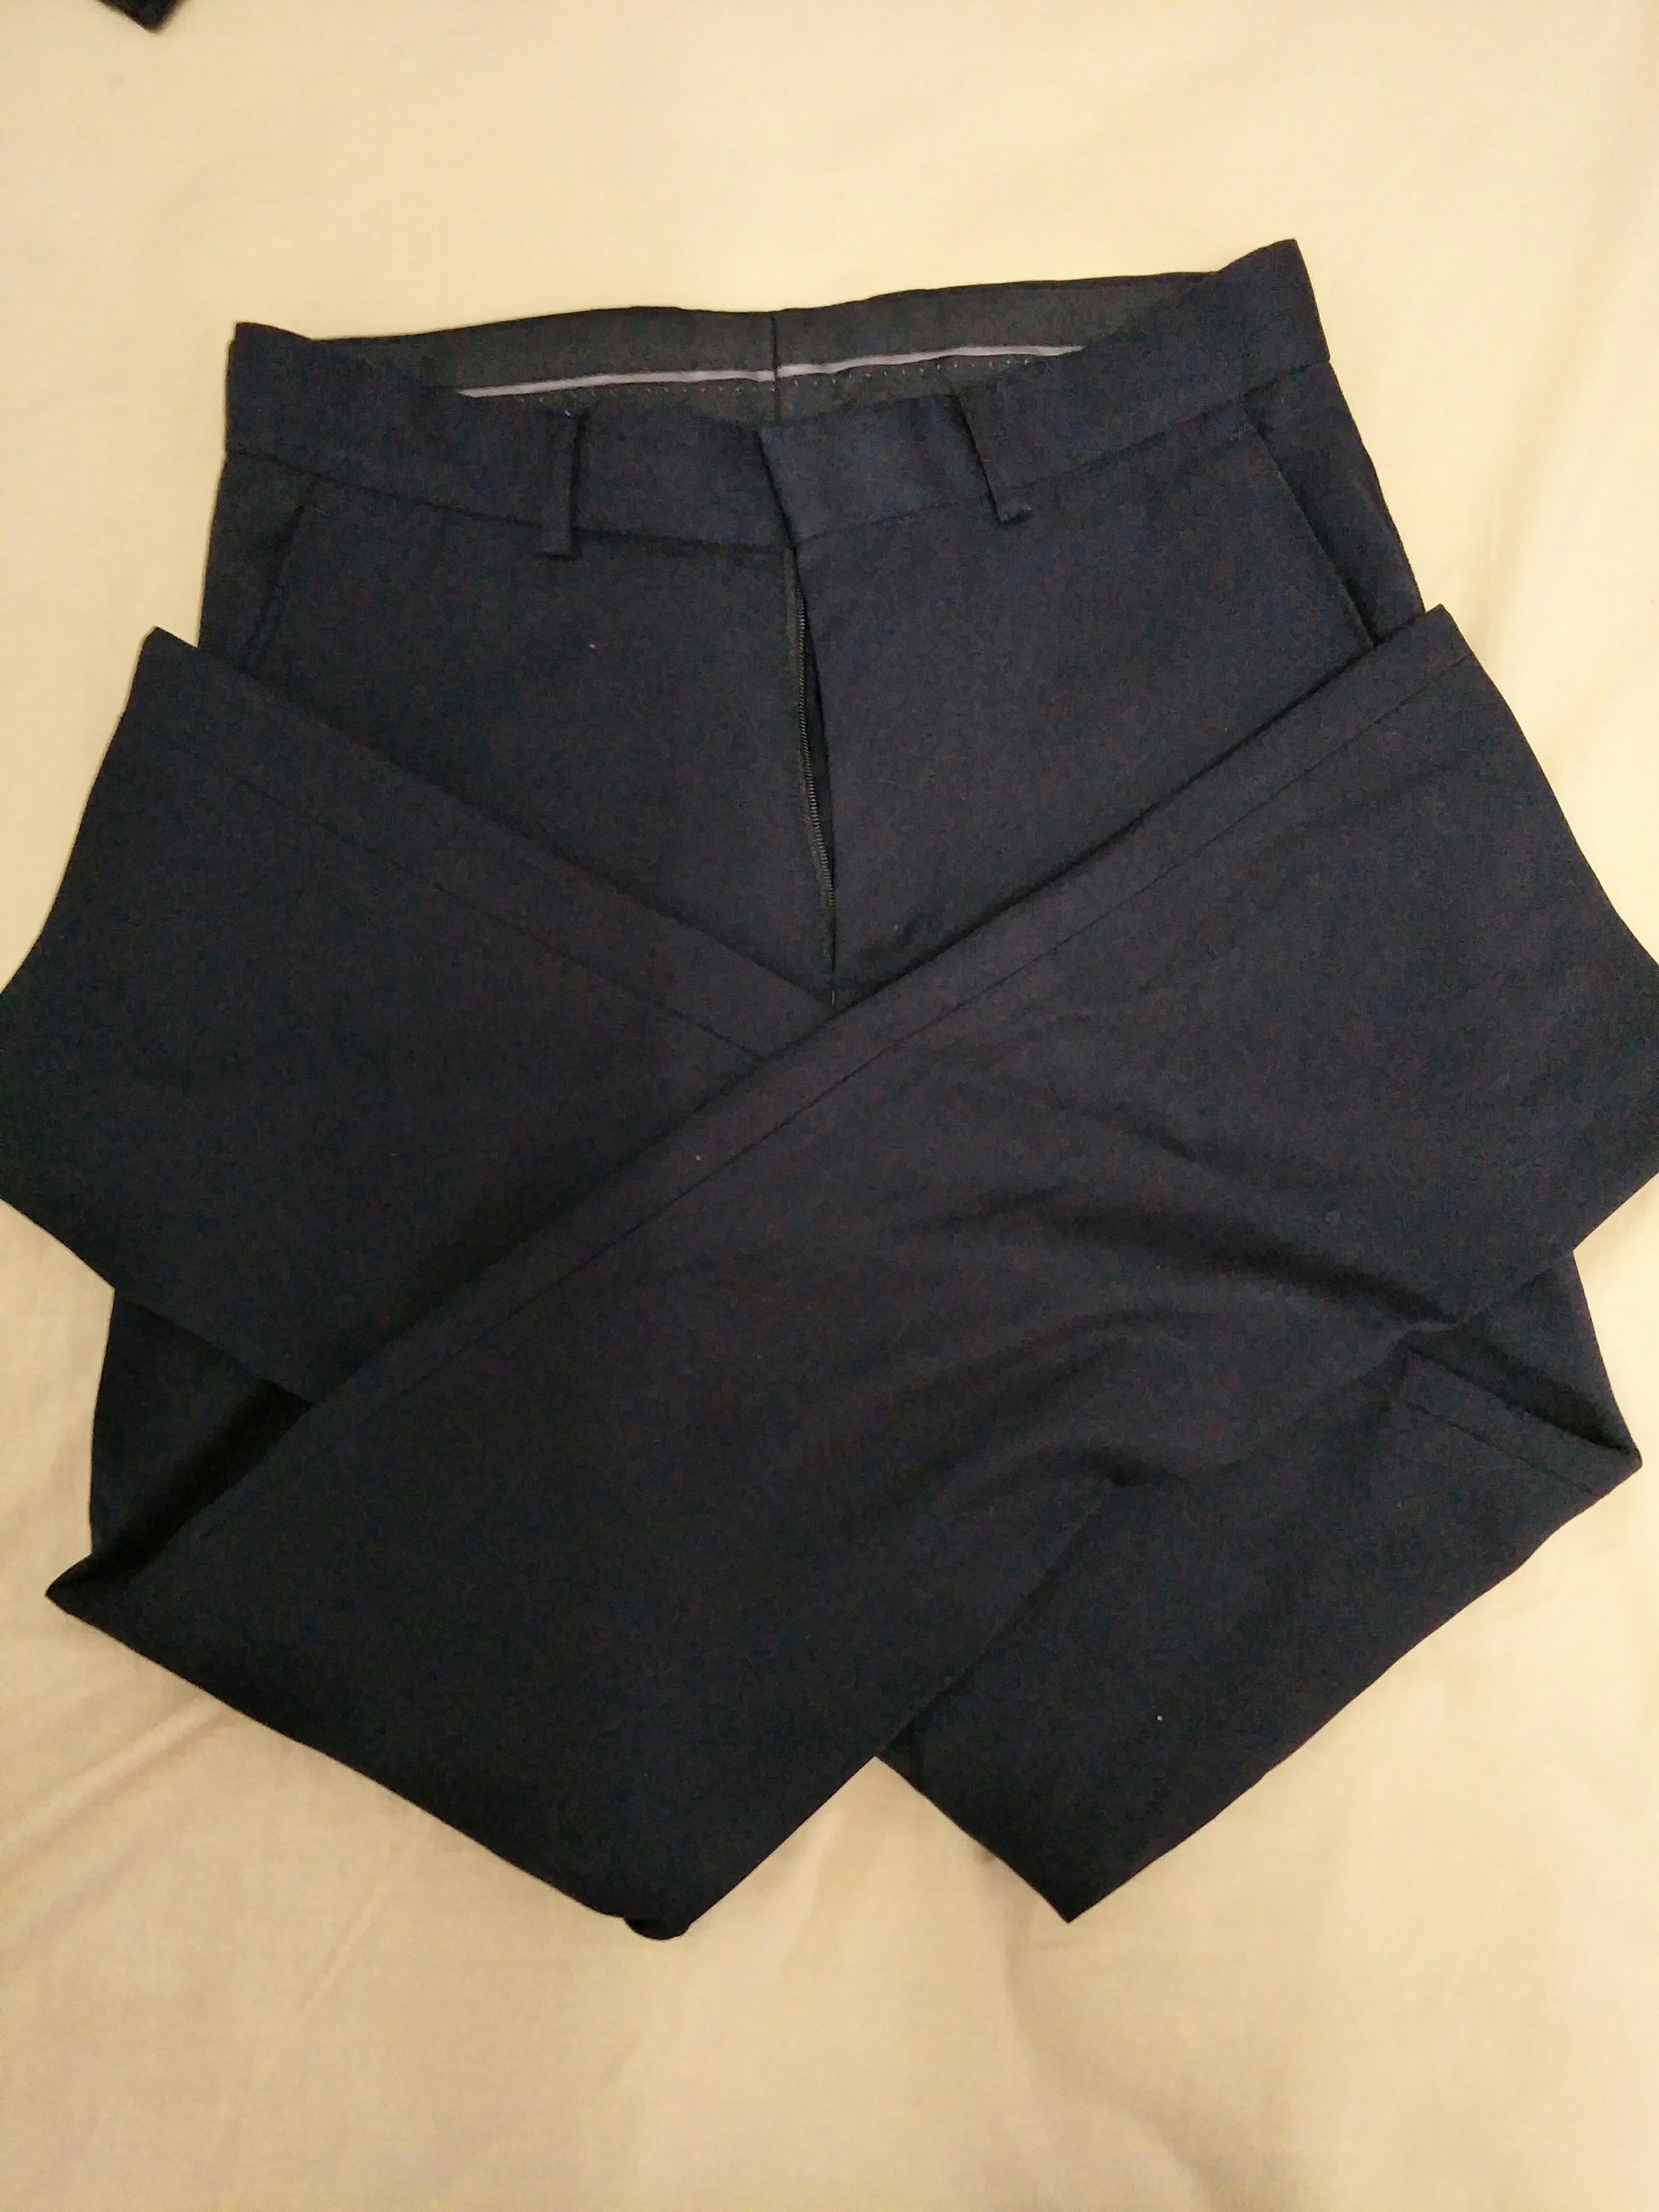 Topman office pants size 28